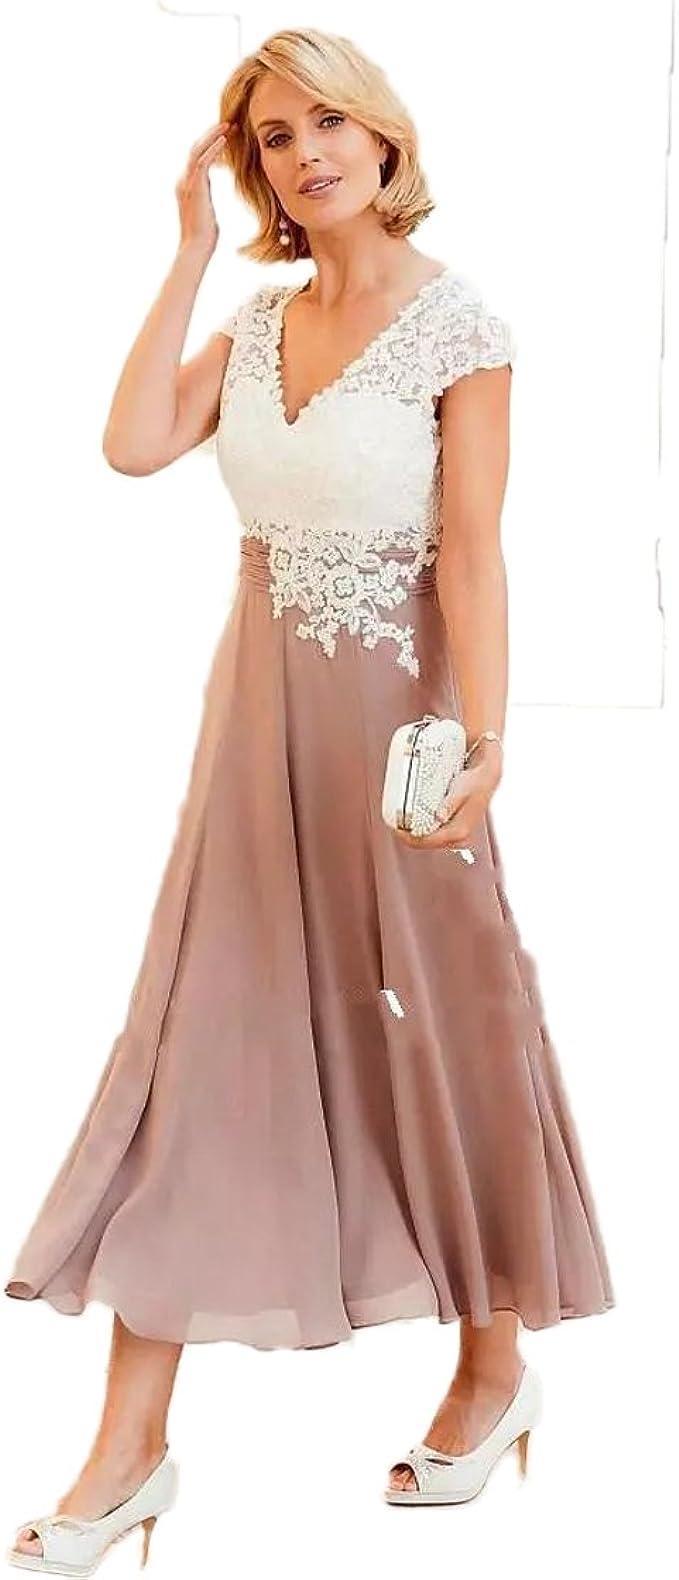 Madedress Mutter der Braut Kleider V-Ausschnitt Kappenhülsen Applikationen  Spitze Chiffon Falten Teelänge Abendkleid Frau Formal Party Kleid